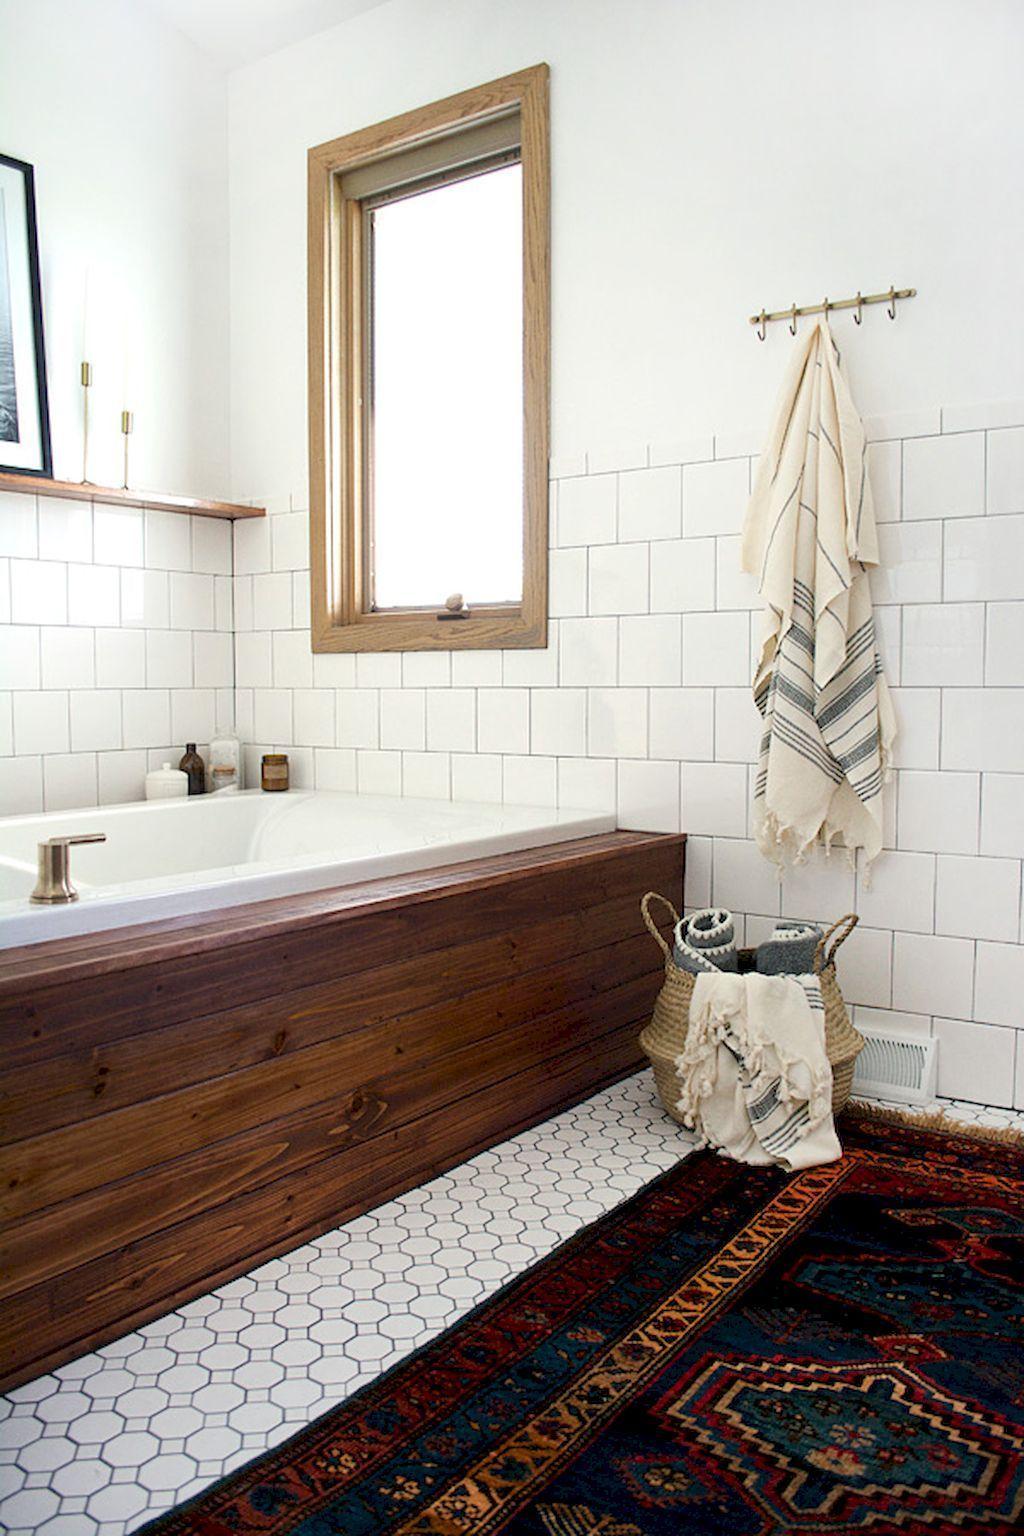 Pin by Bathroom Styles on Rustic Bathrooms Design   Pinterest ...